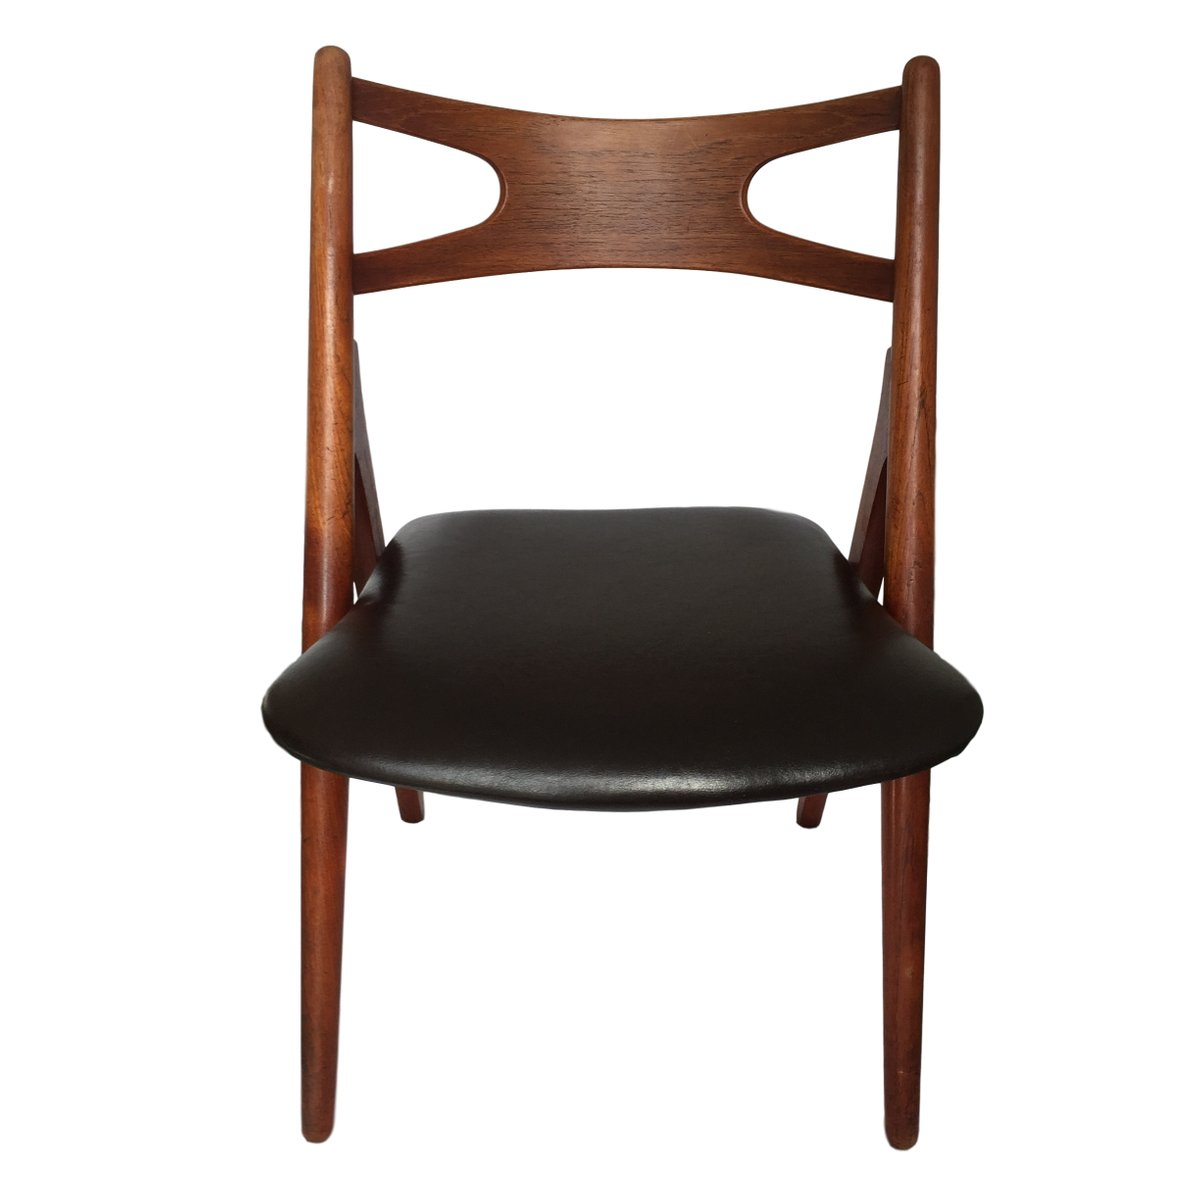 carl hansen chairs. CH-29 Sawbuck Chairs In Teak By Hans Wegner For Carl Hansen \u0026 Søn, 1950s, Set Of 6